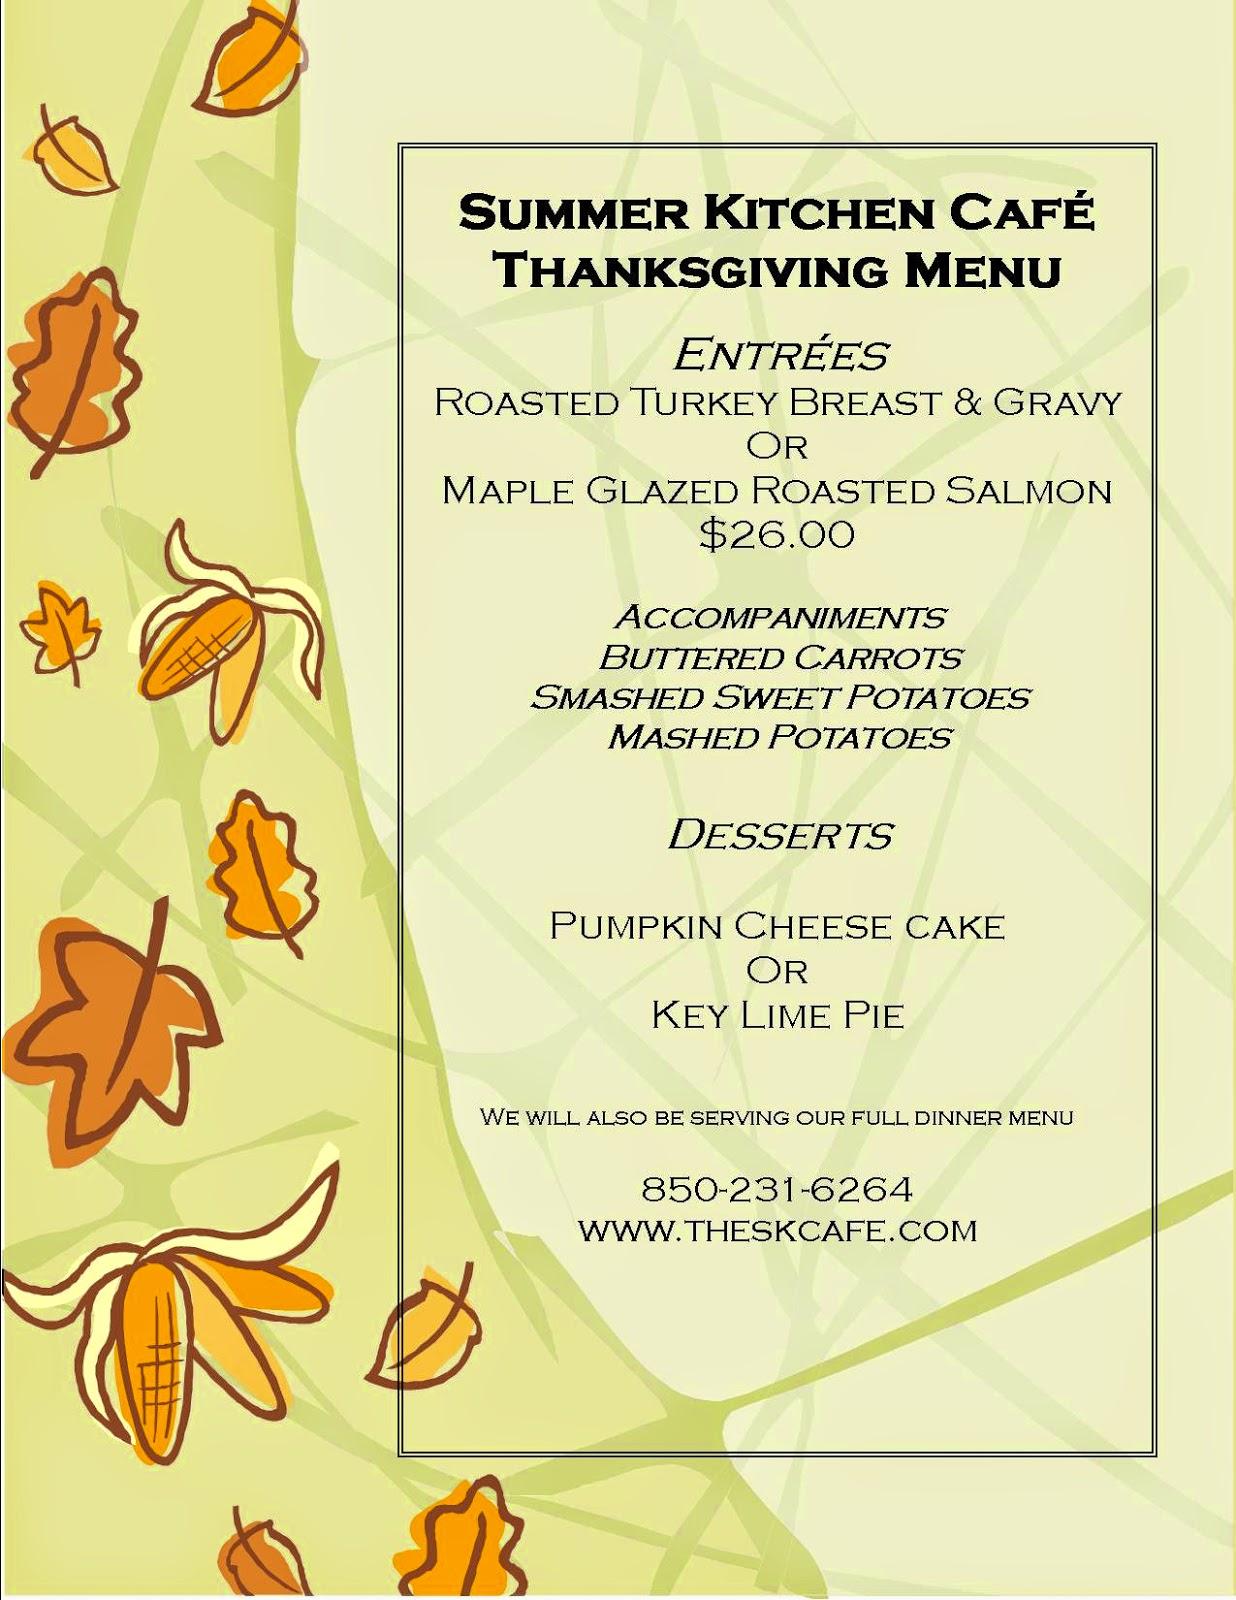 sunday november 23 2014 - Summer Kitchen Menu